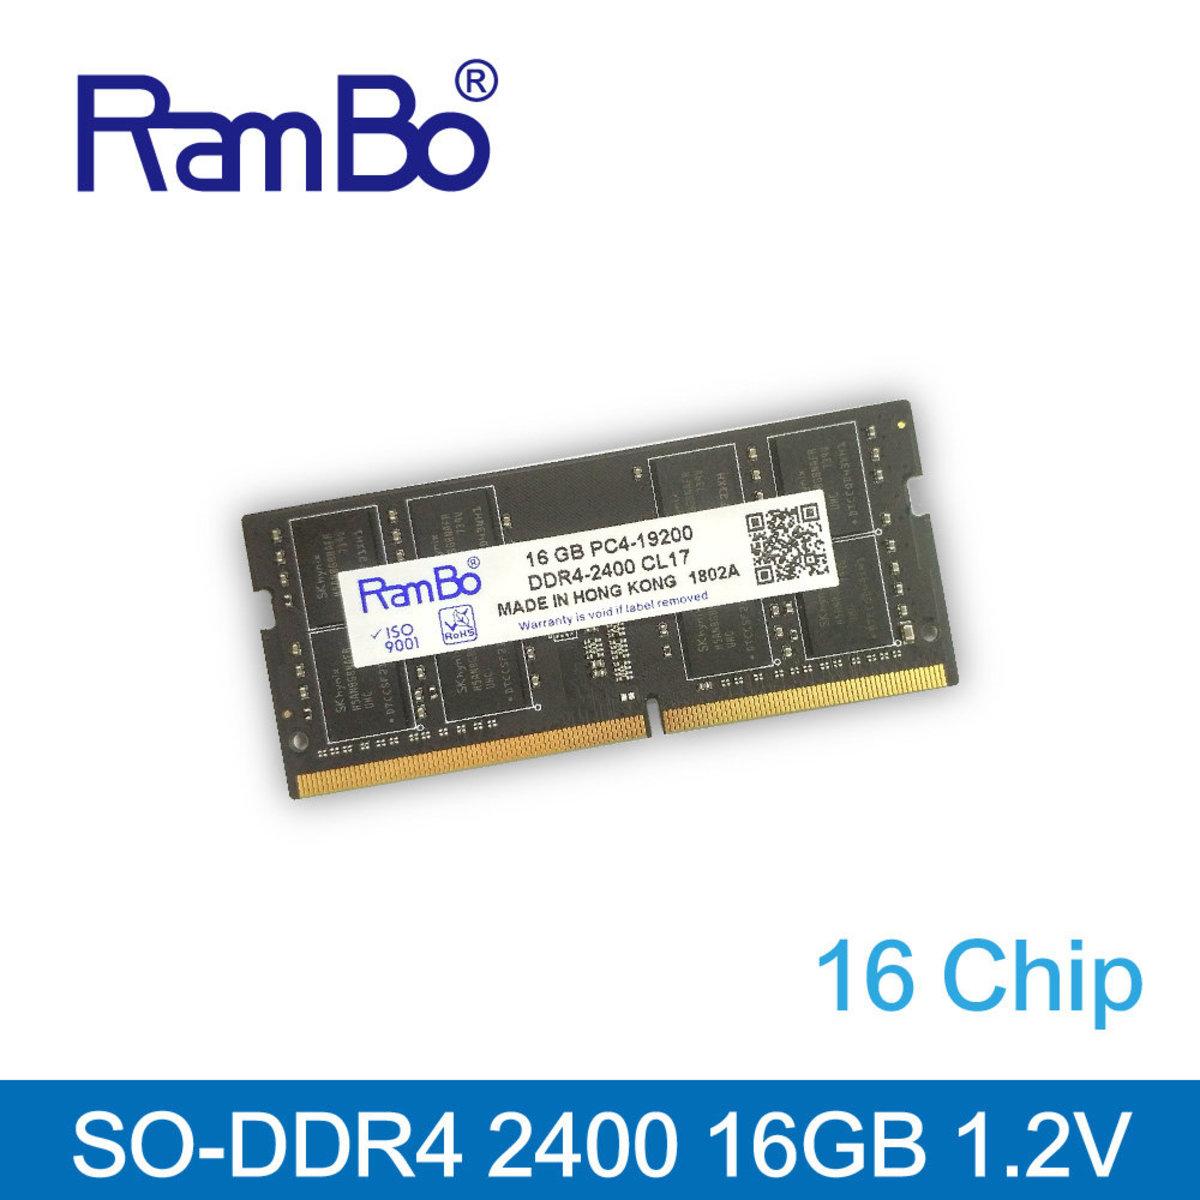 16GB PC4-19200 DDR4 2400 SO DIMM SDRAM for PC 記憶體 內存條